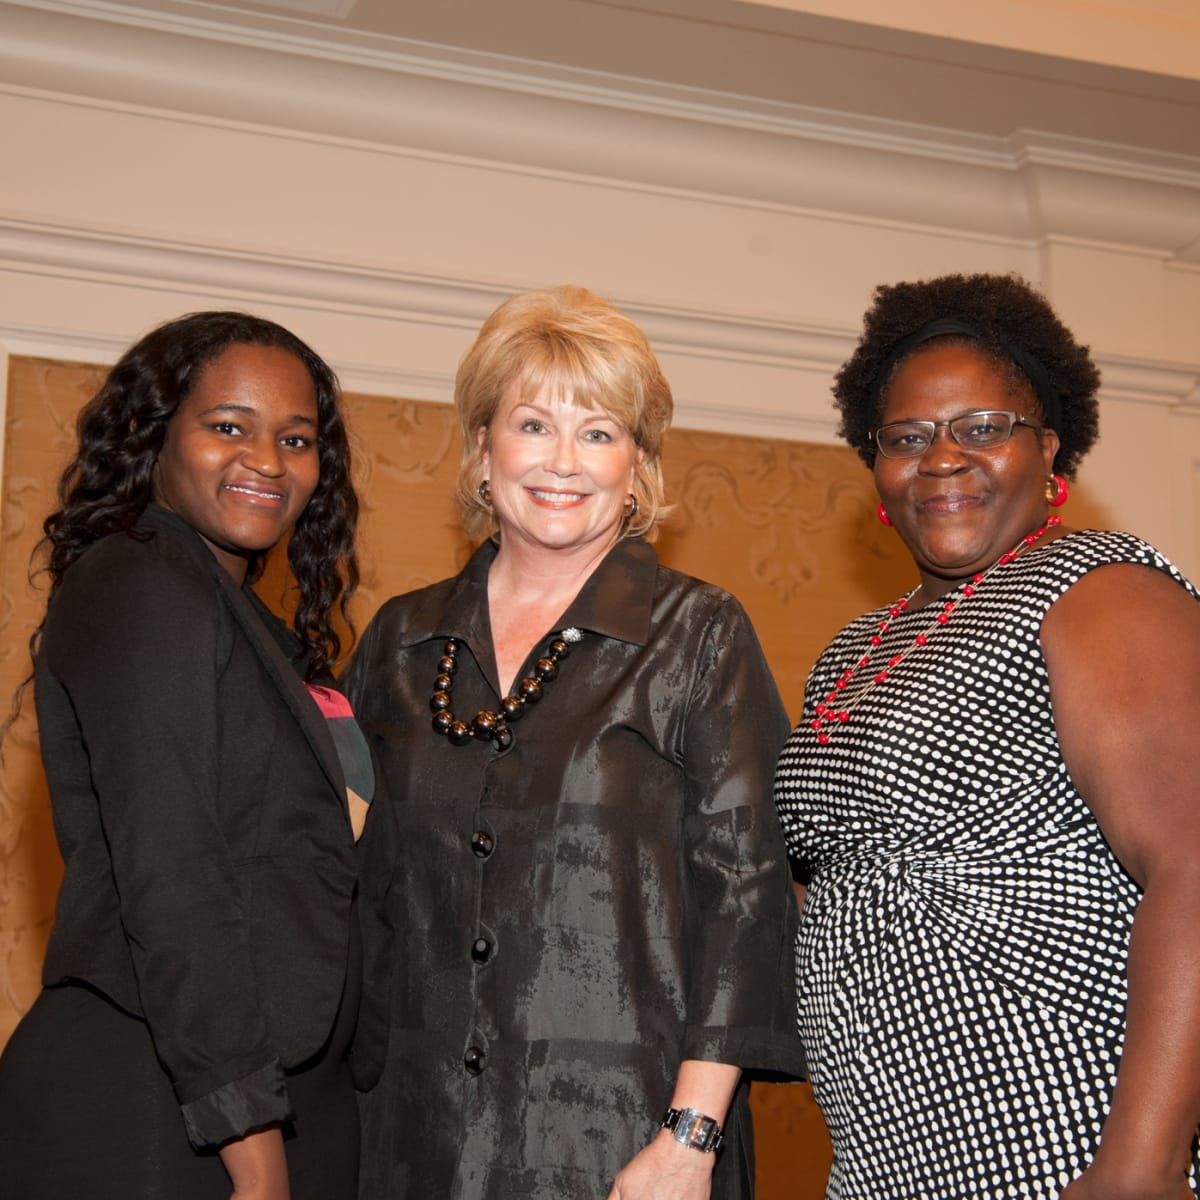 News, shelby, Foundation for Teen Health luncheon, Oct. 2015, Leandra DeWitt, Jan Carson, Catina Hunt